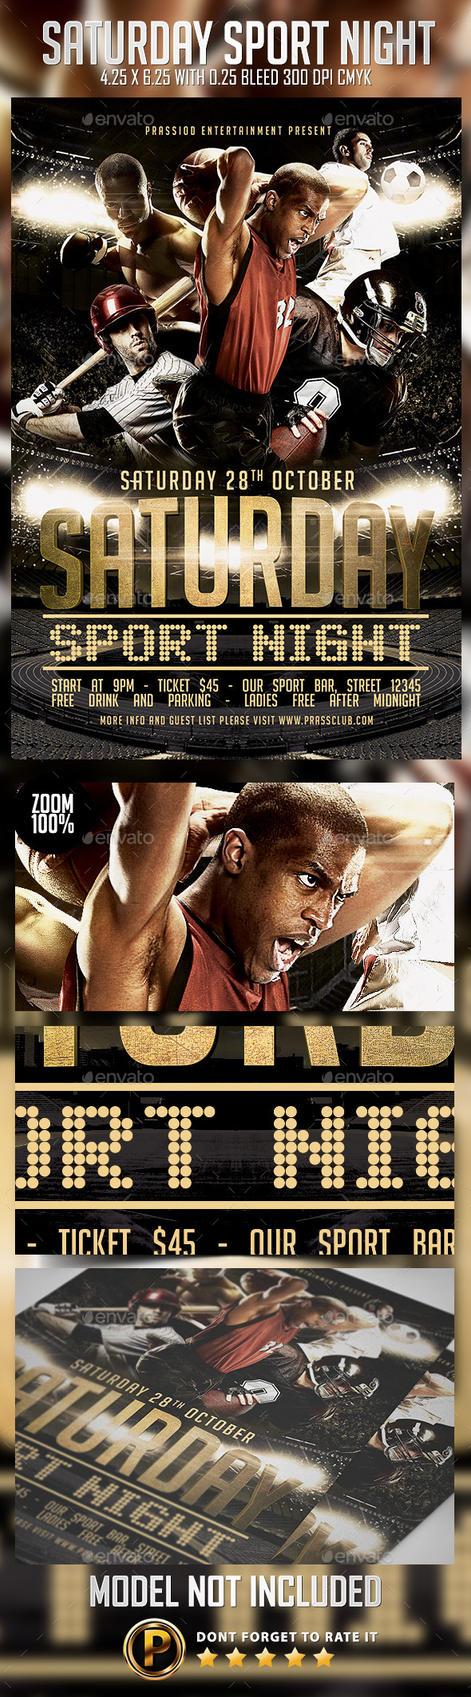 Saturday Sport Night Flyer Template by prassetyo